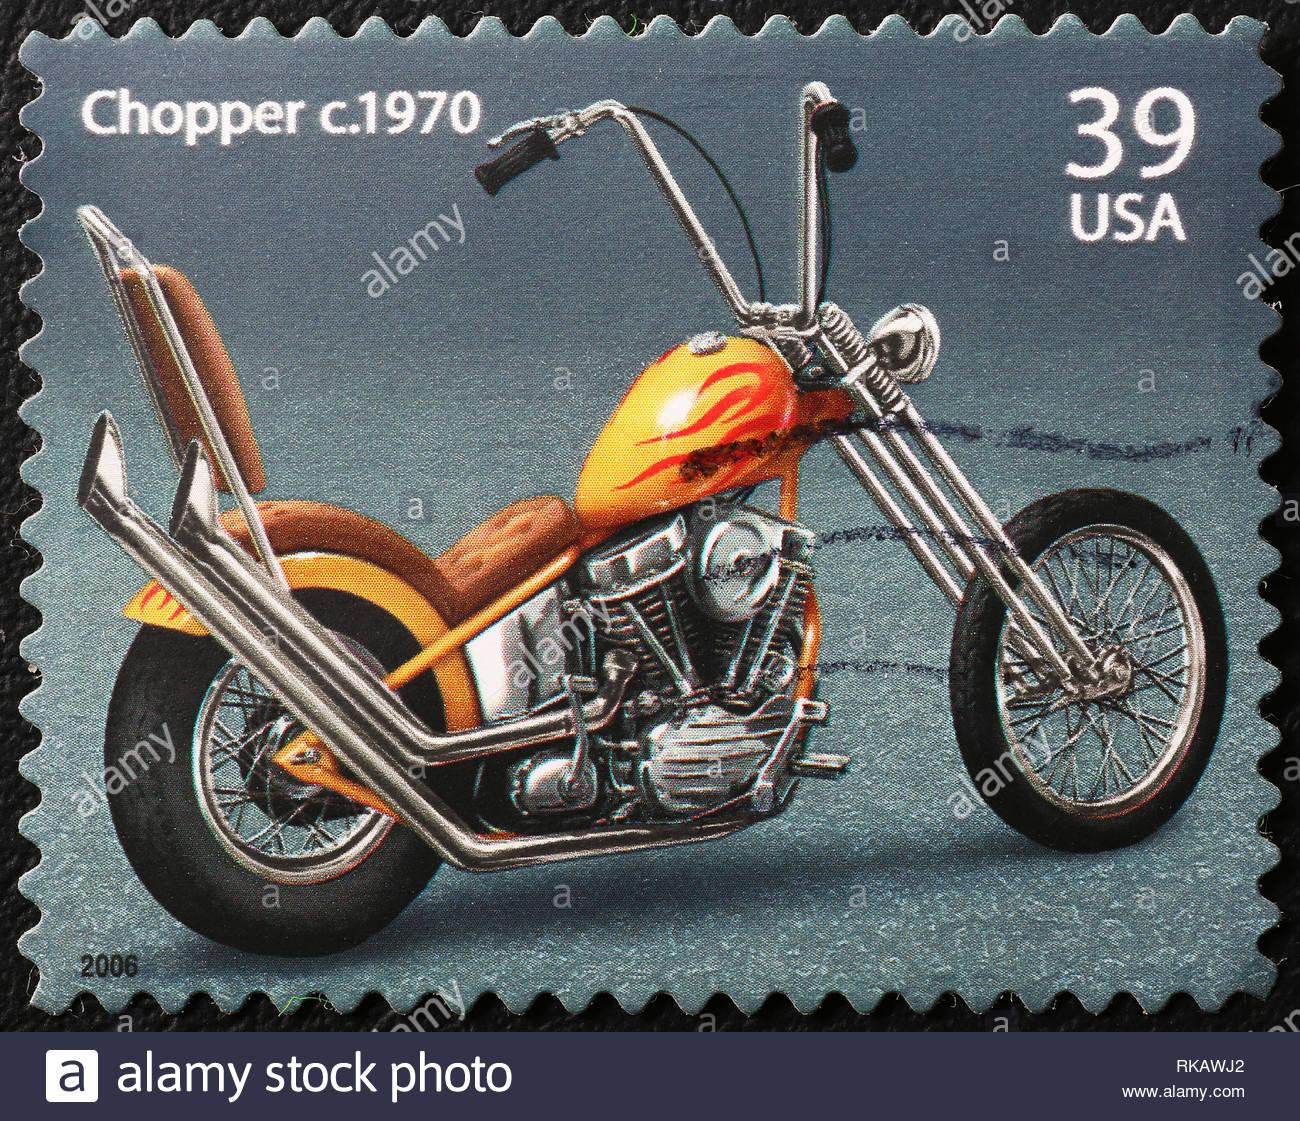 Vintage chopper on american postage stamp - Stock Image